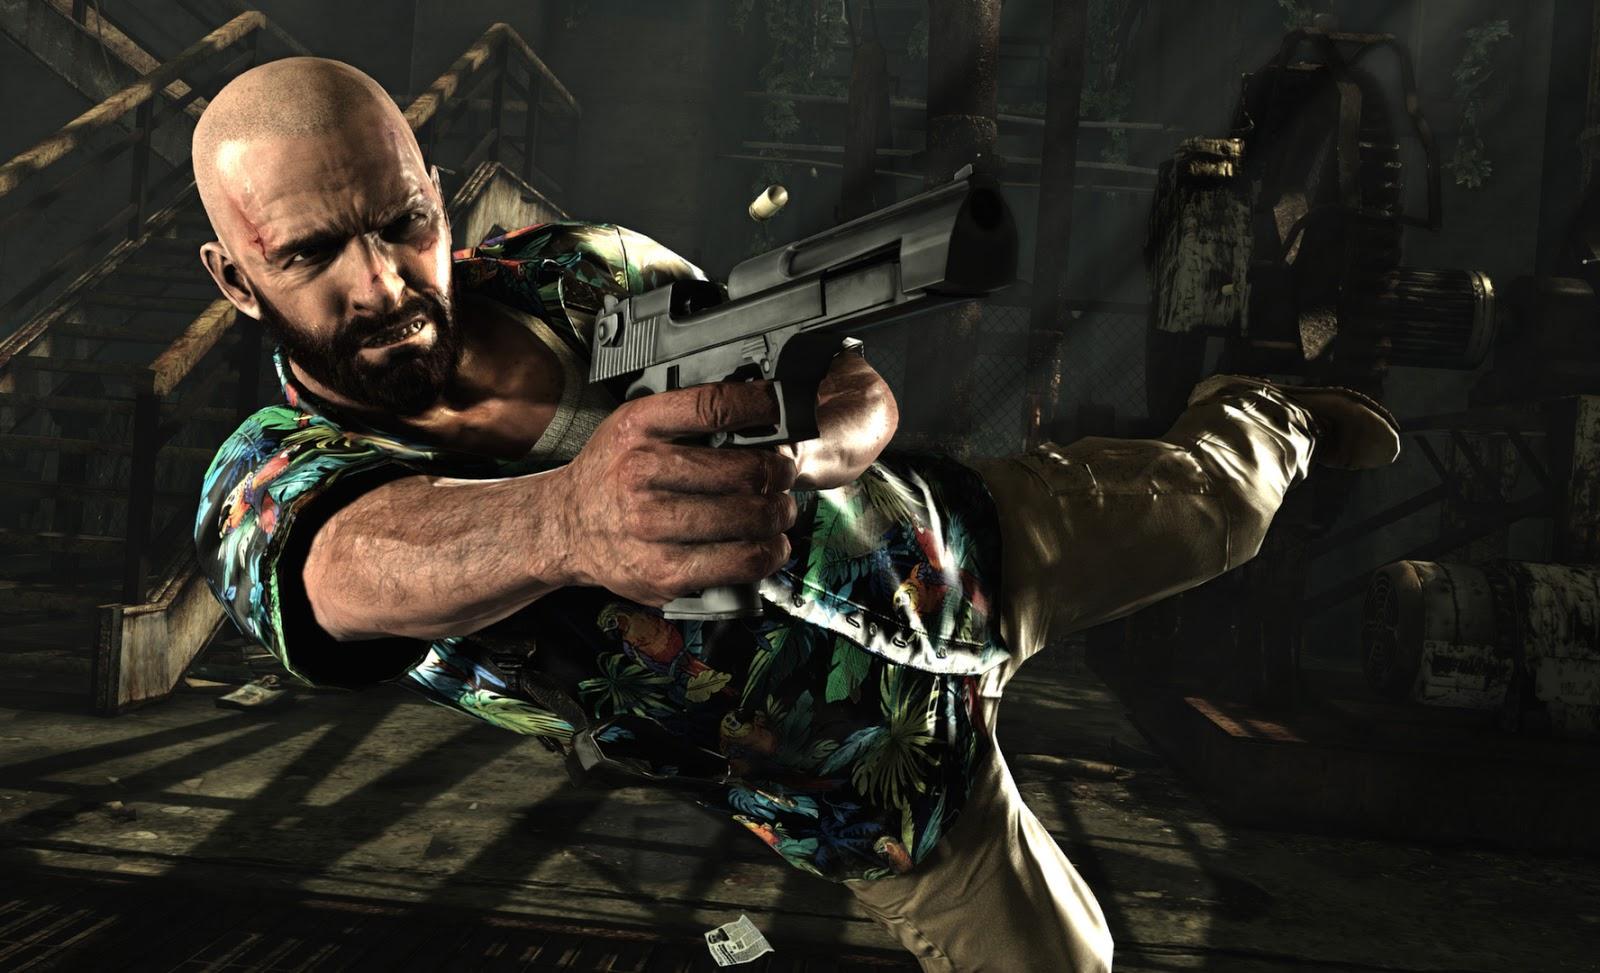 Max Payne 3 Complete Edition ESPAÑOL PC Descargar Full (RELOADED) + REPACK 5 DVD5 (JPW) 1